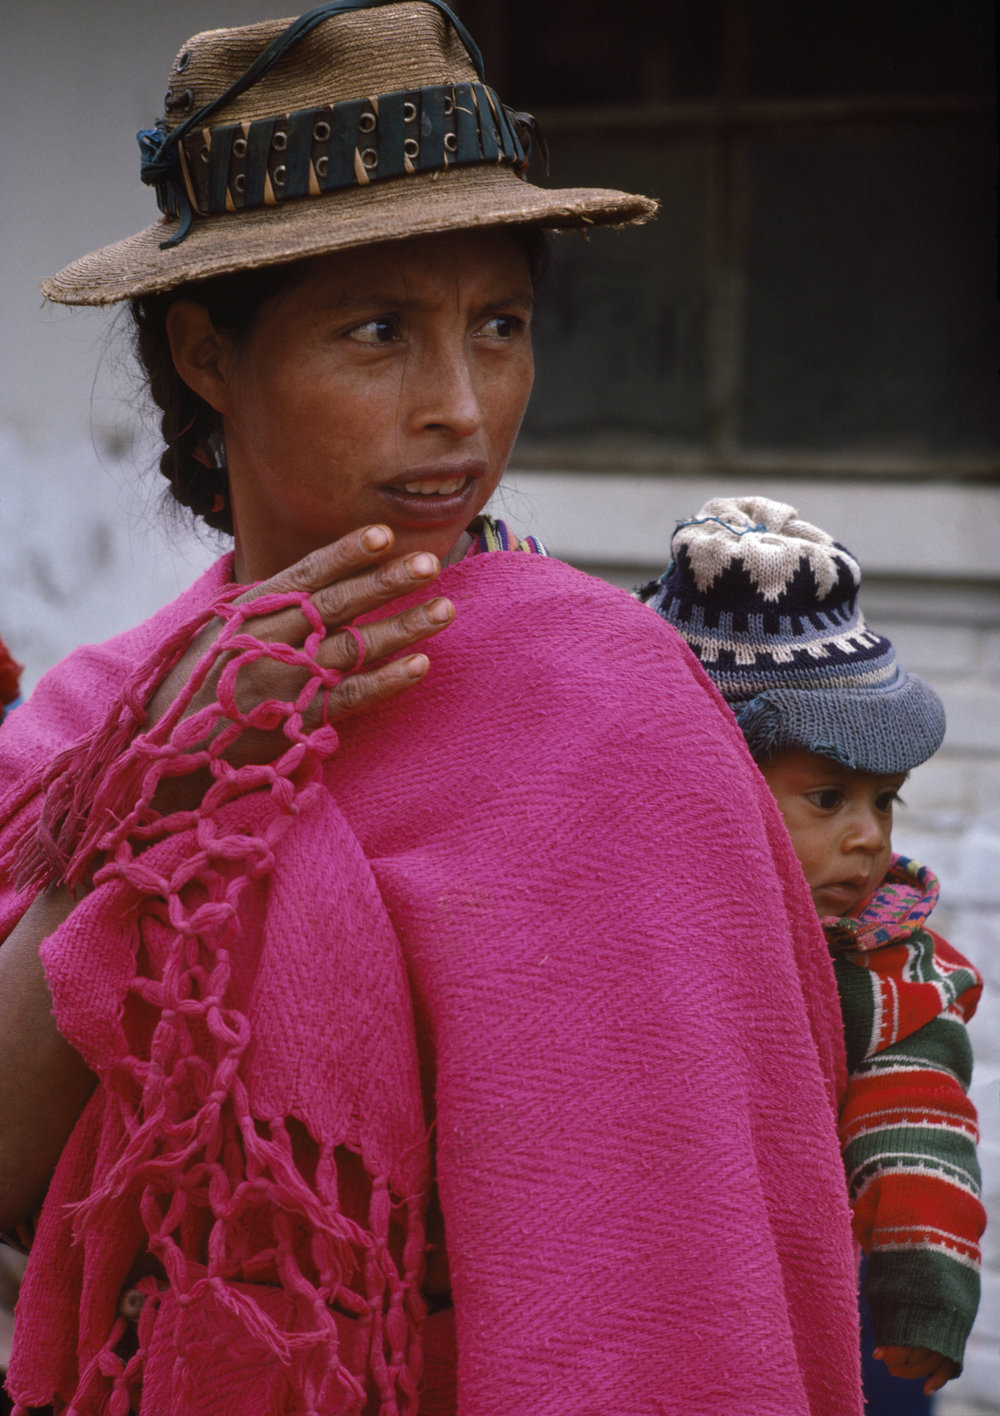 A woman observes a civil defense checkpoint in rural Huehuetenango, Guatemala on September 1, 1982.